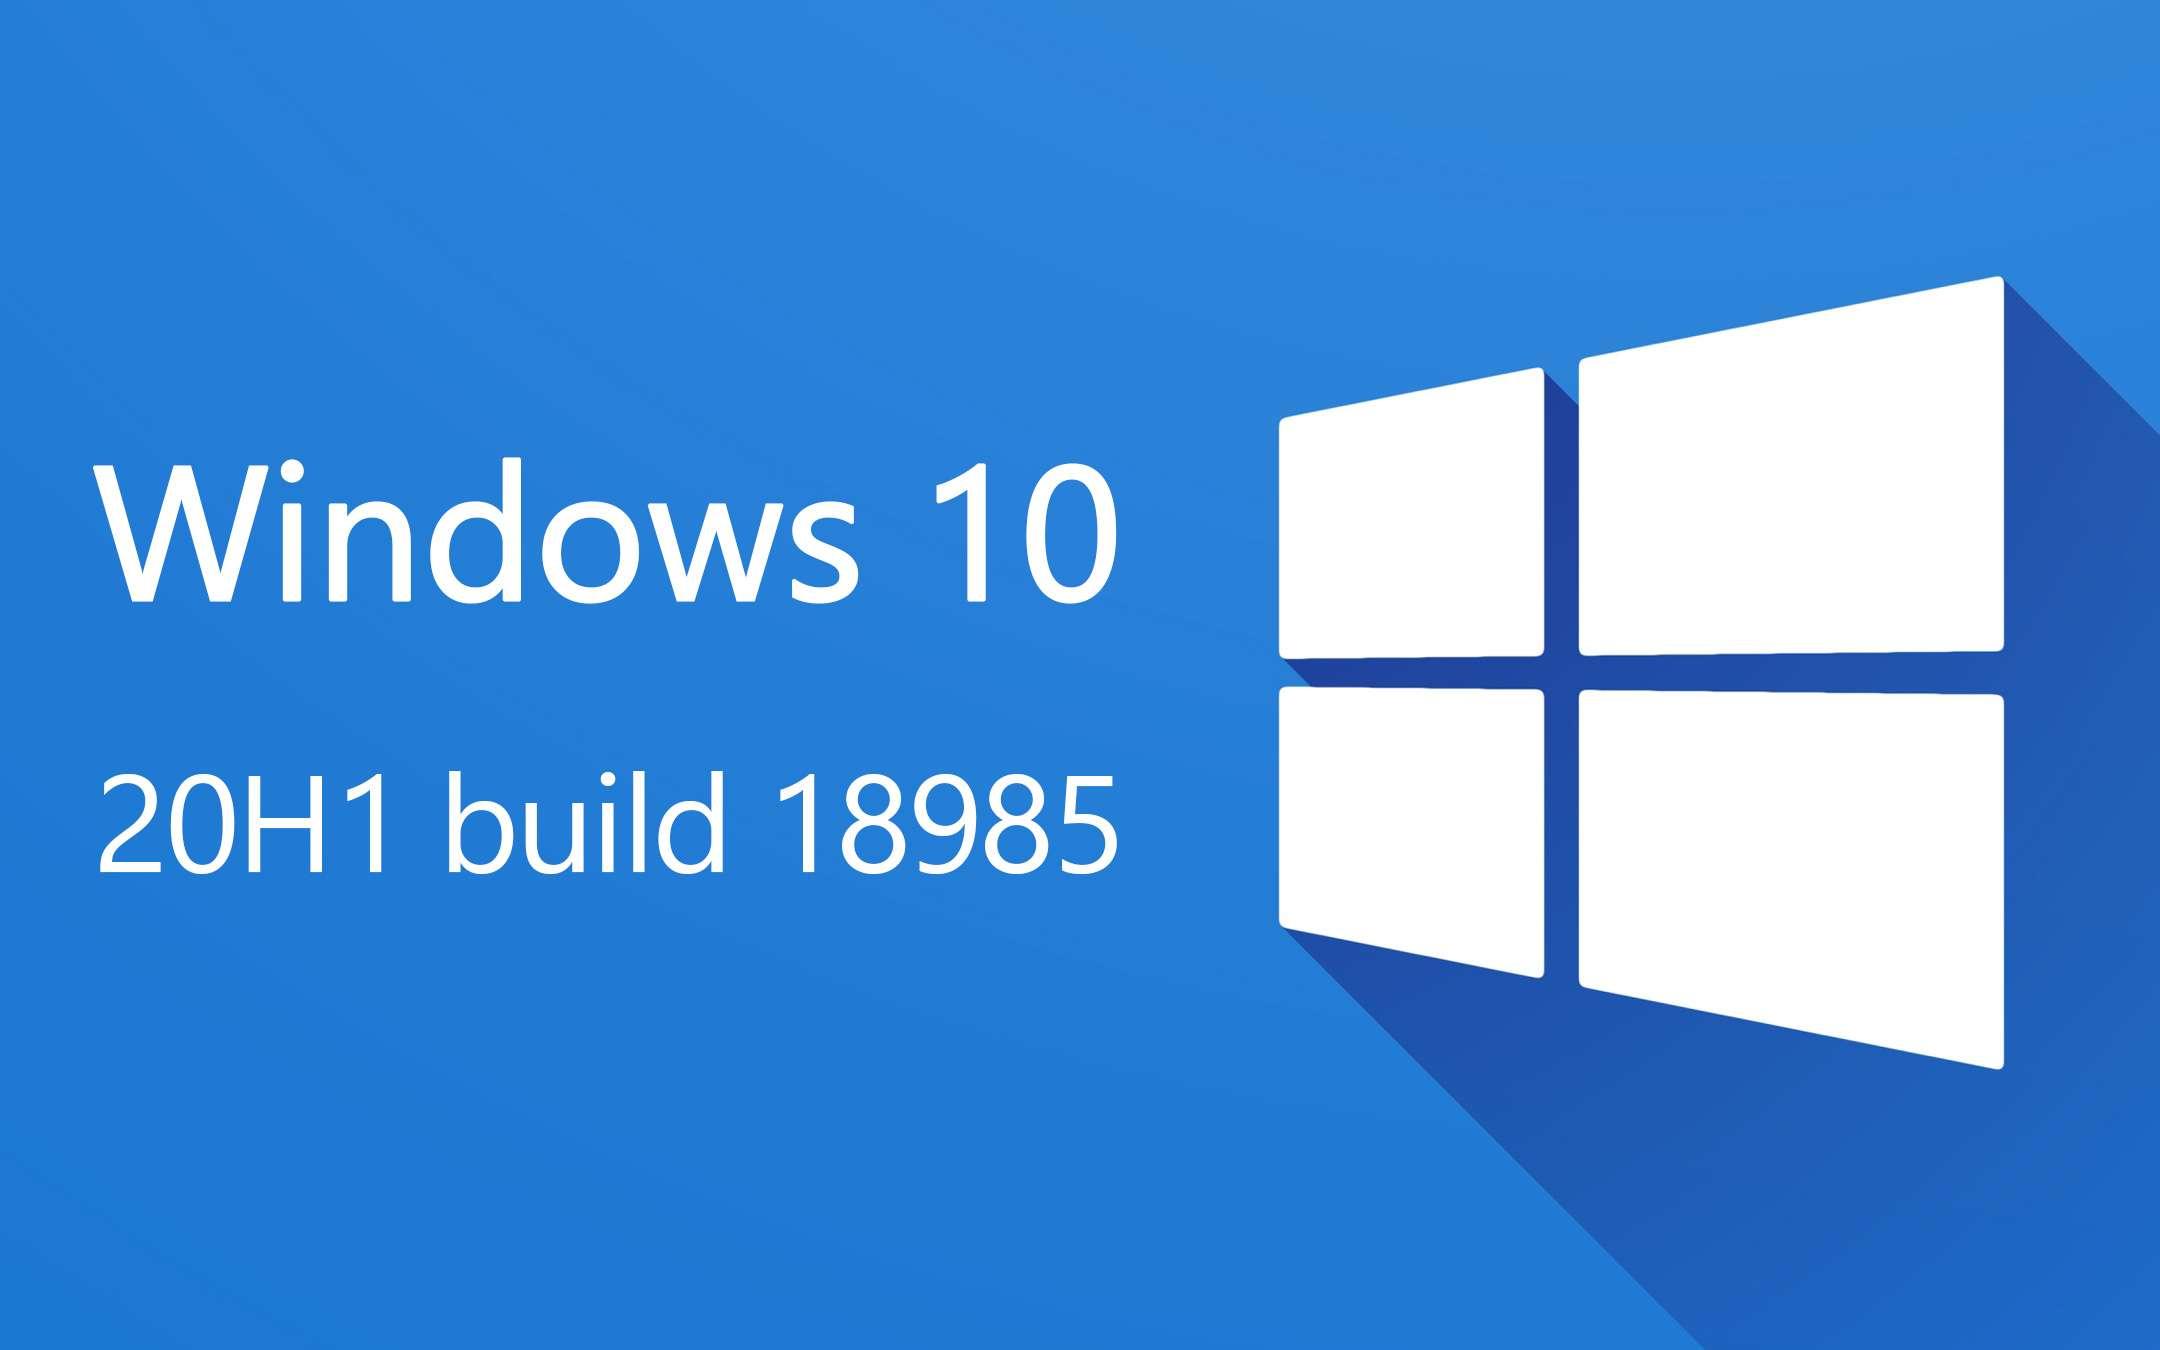 Windows 10 20H1 build 18985